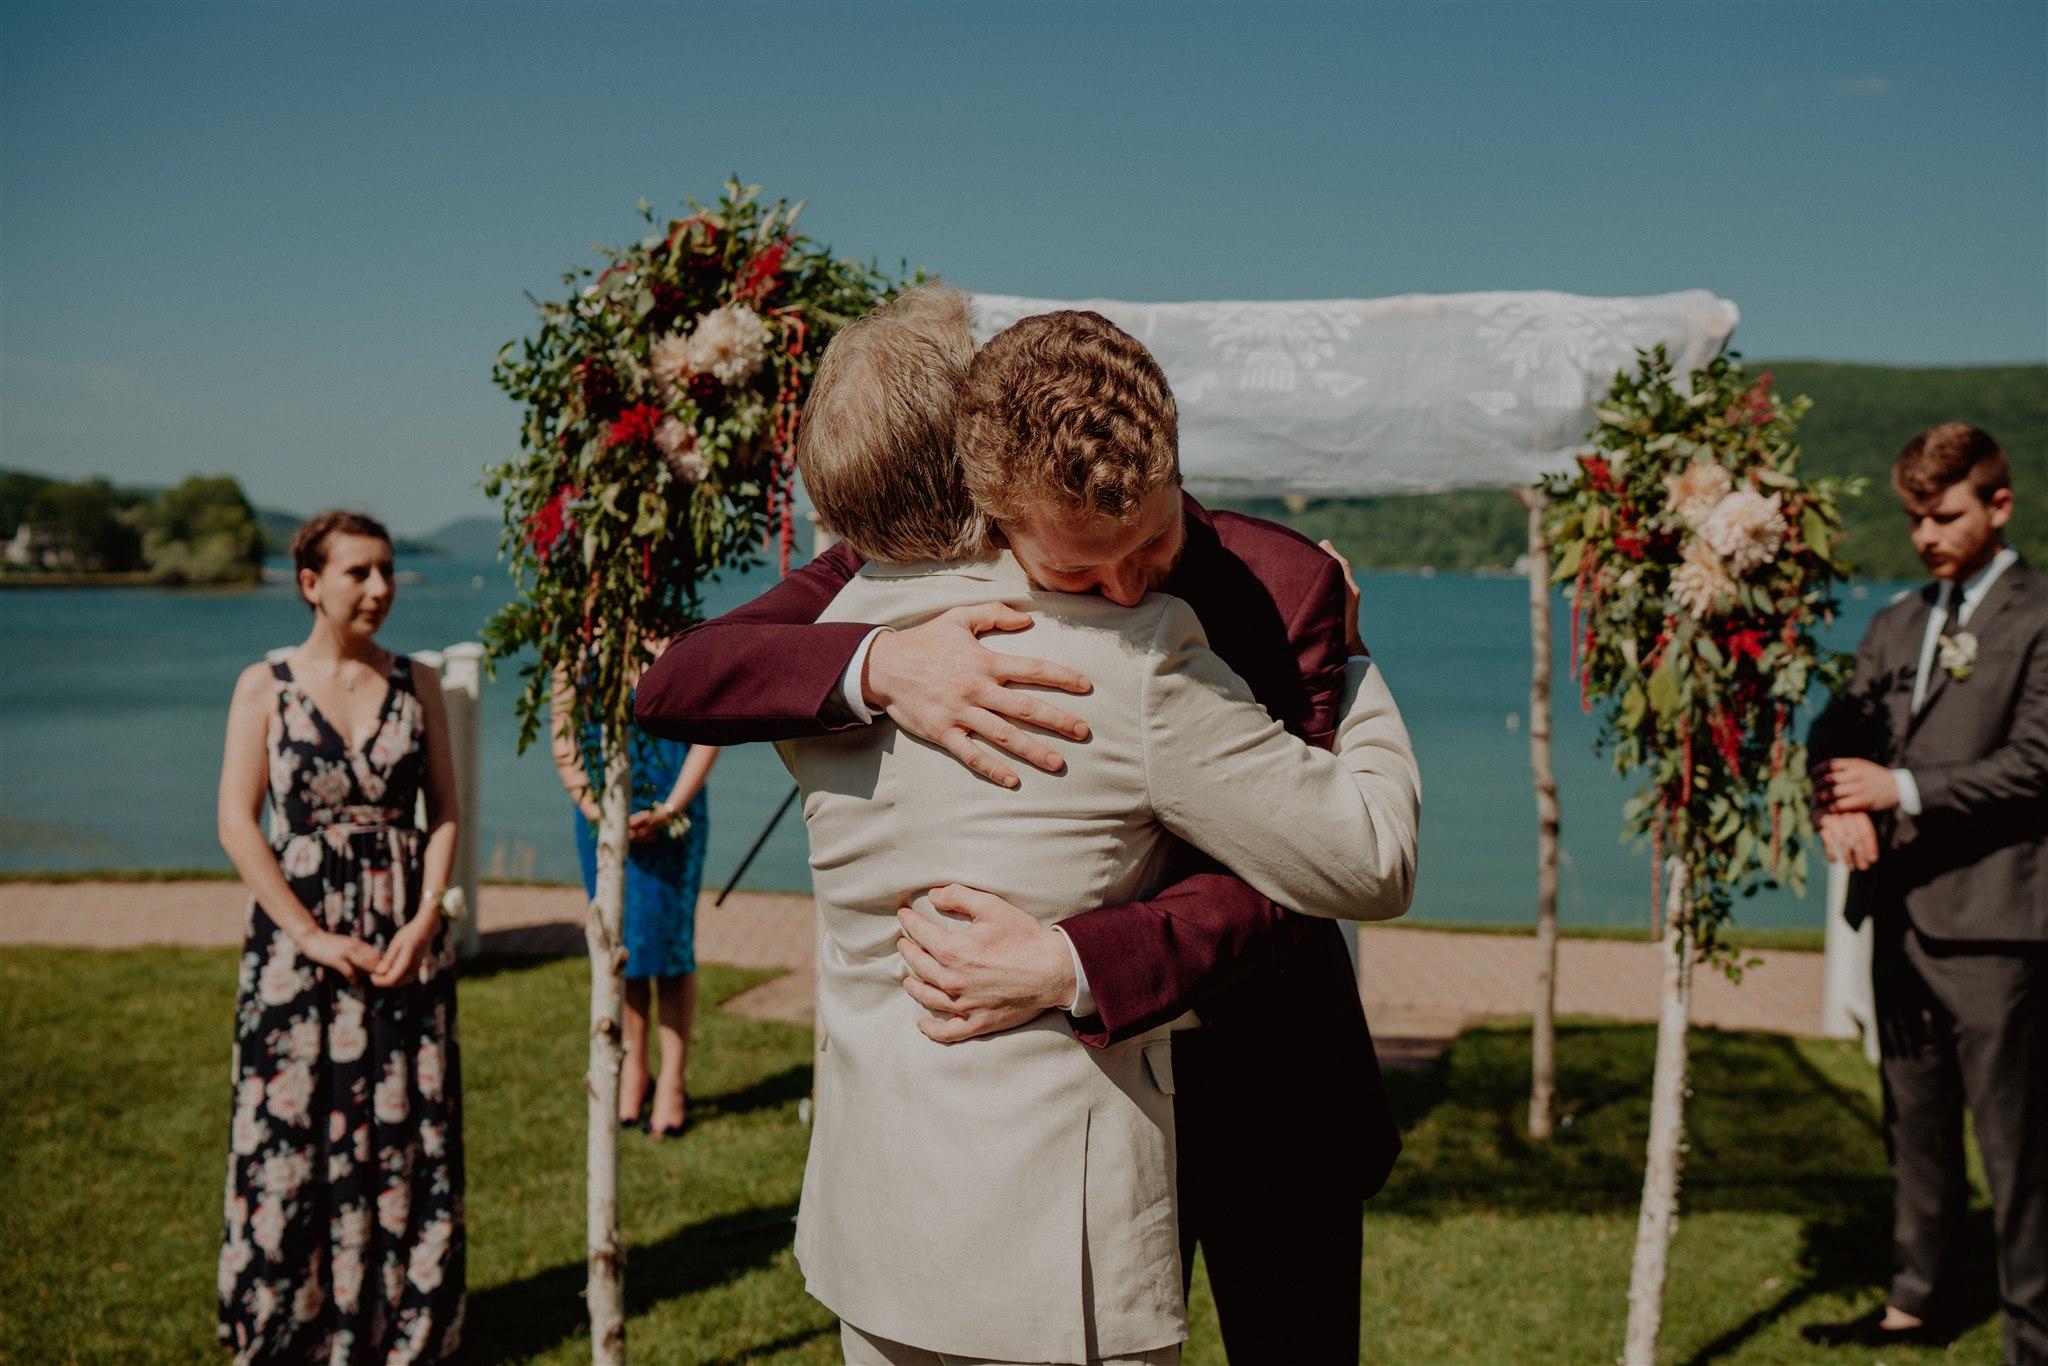 Chellise_Michael_Photography_Hudson_Valley_Wedding_Photographer_Otesaga_Hotel-3047.jpg